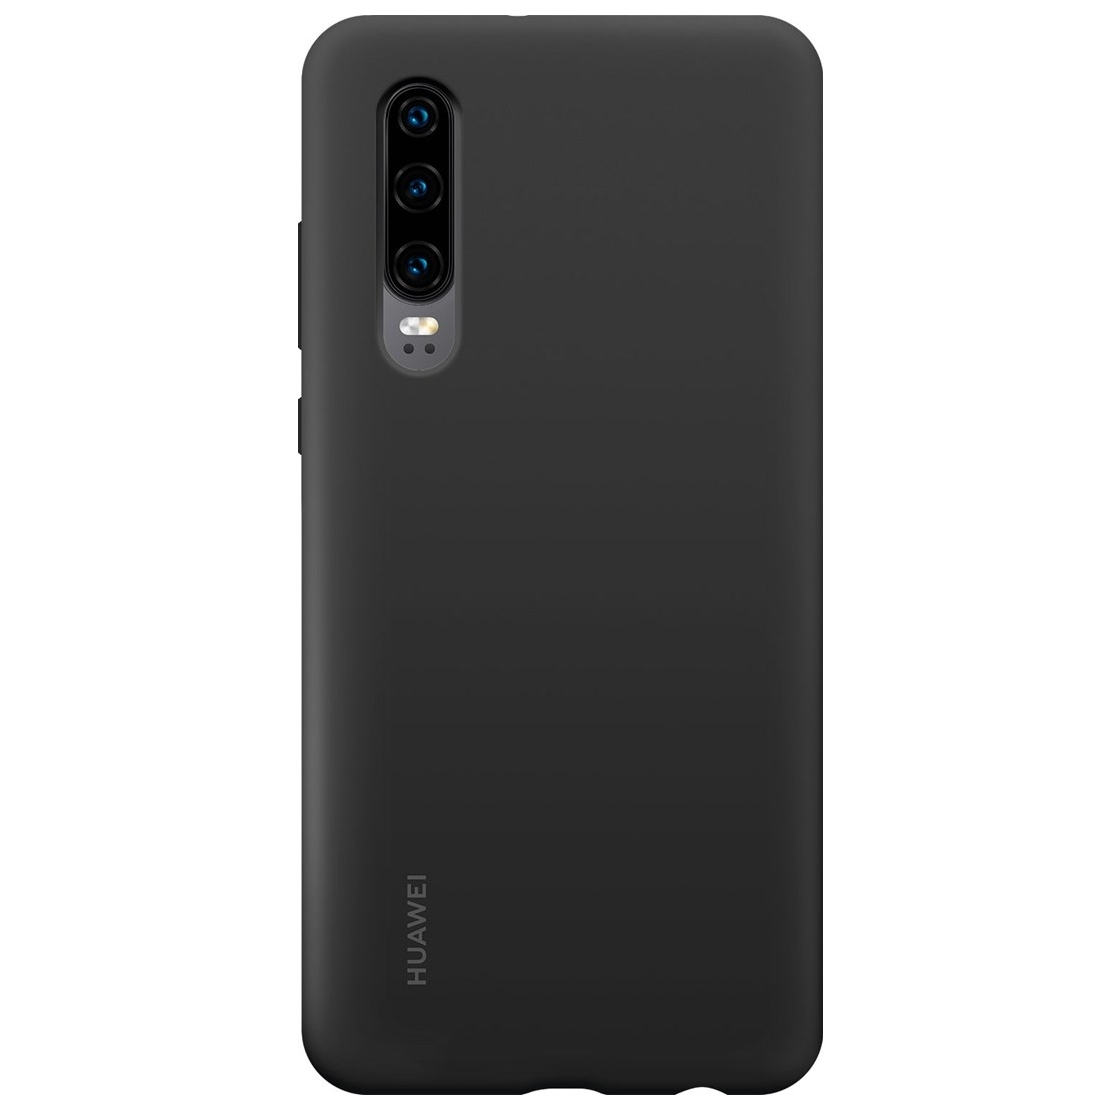 Capac protectie spate Huawei Silicone Cover pentru Huawei P30 Black